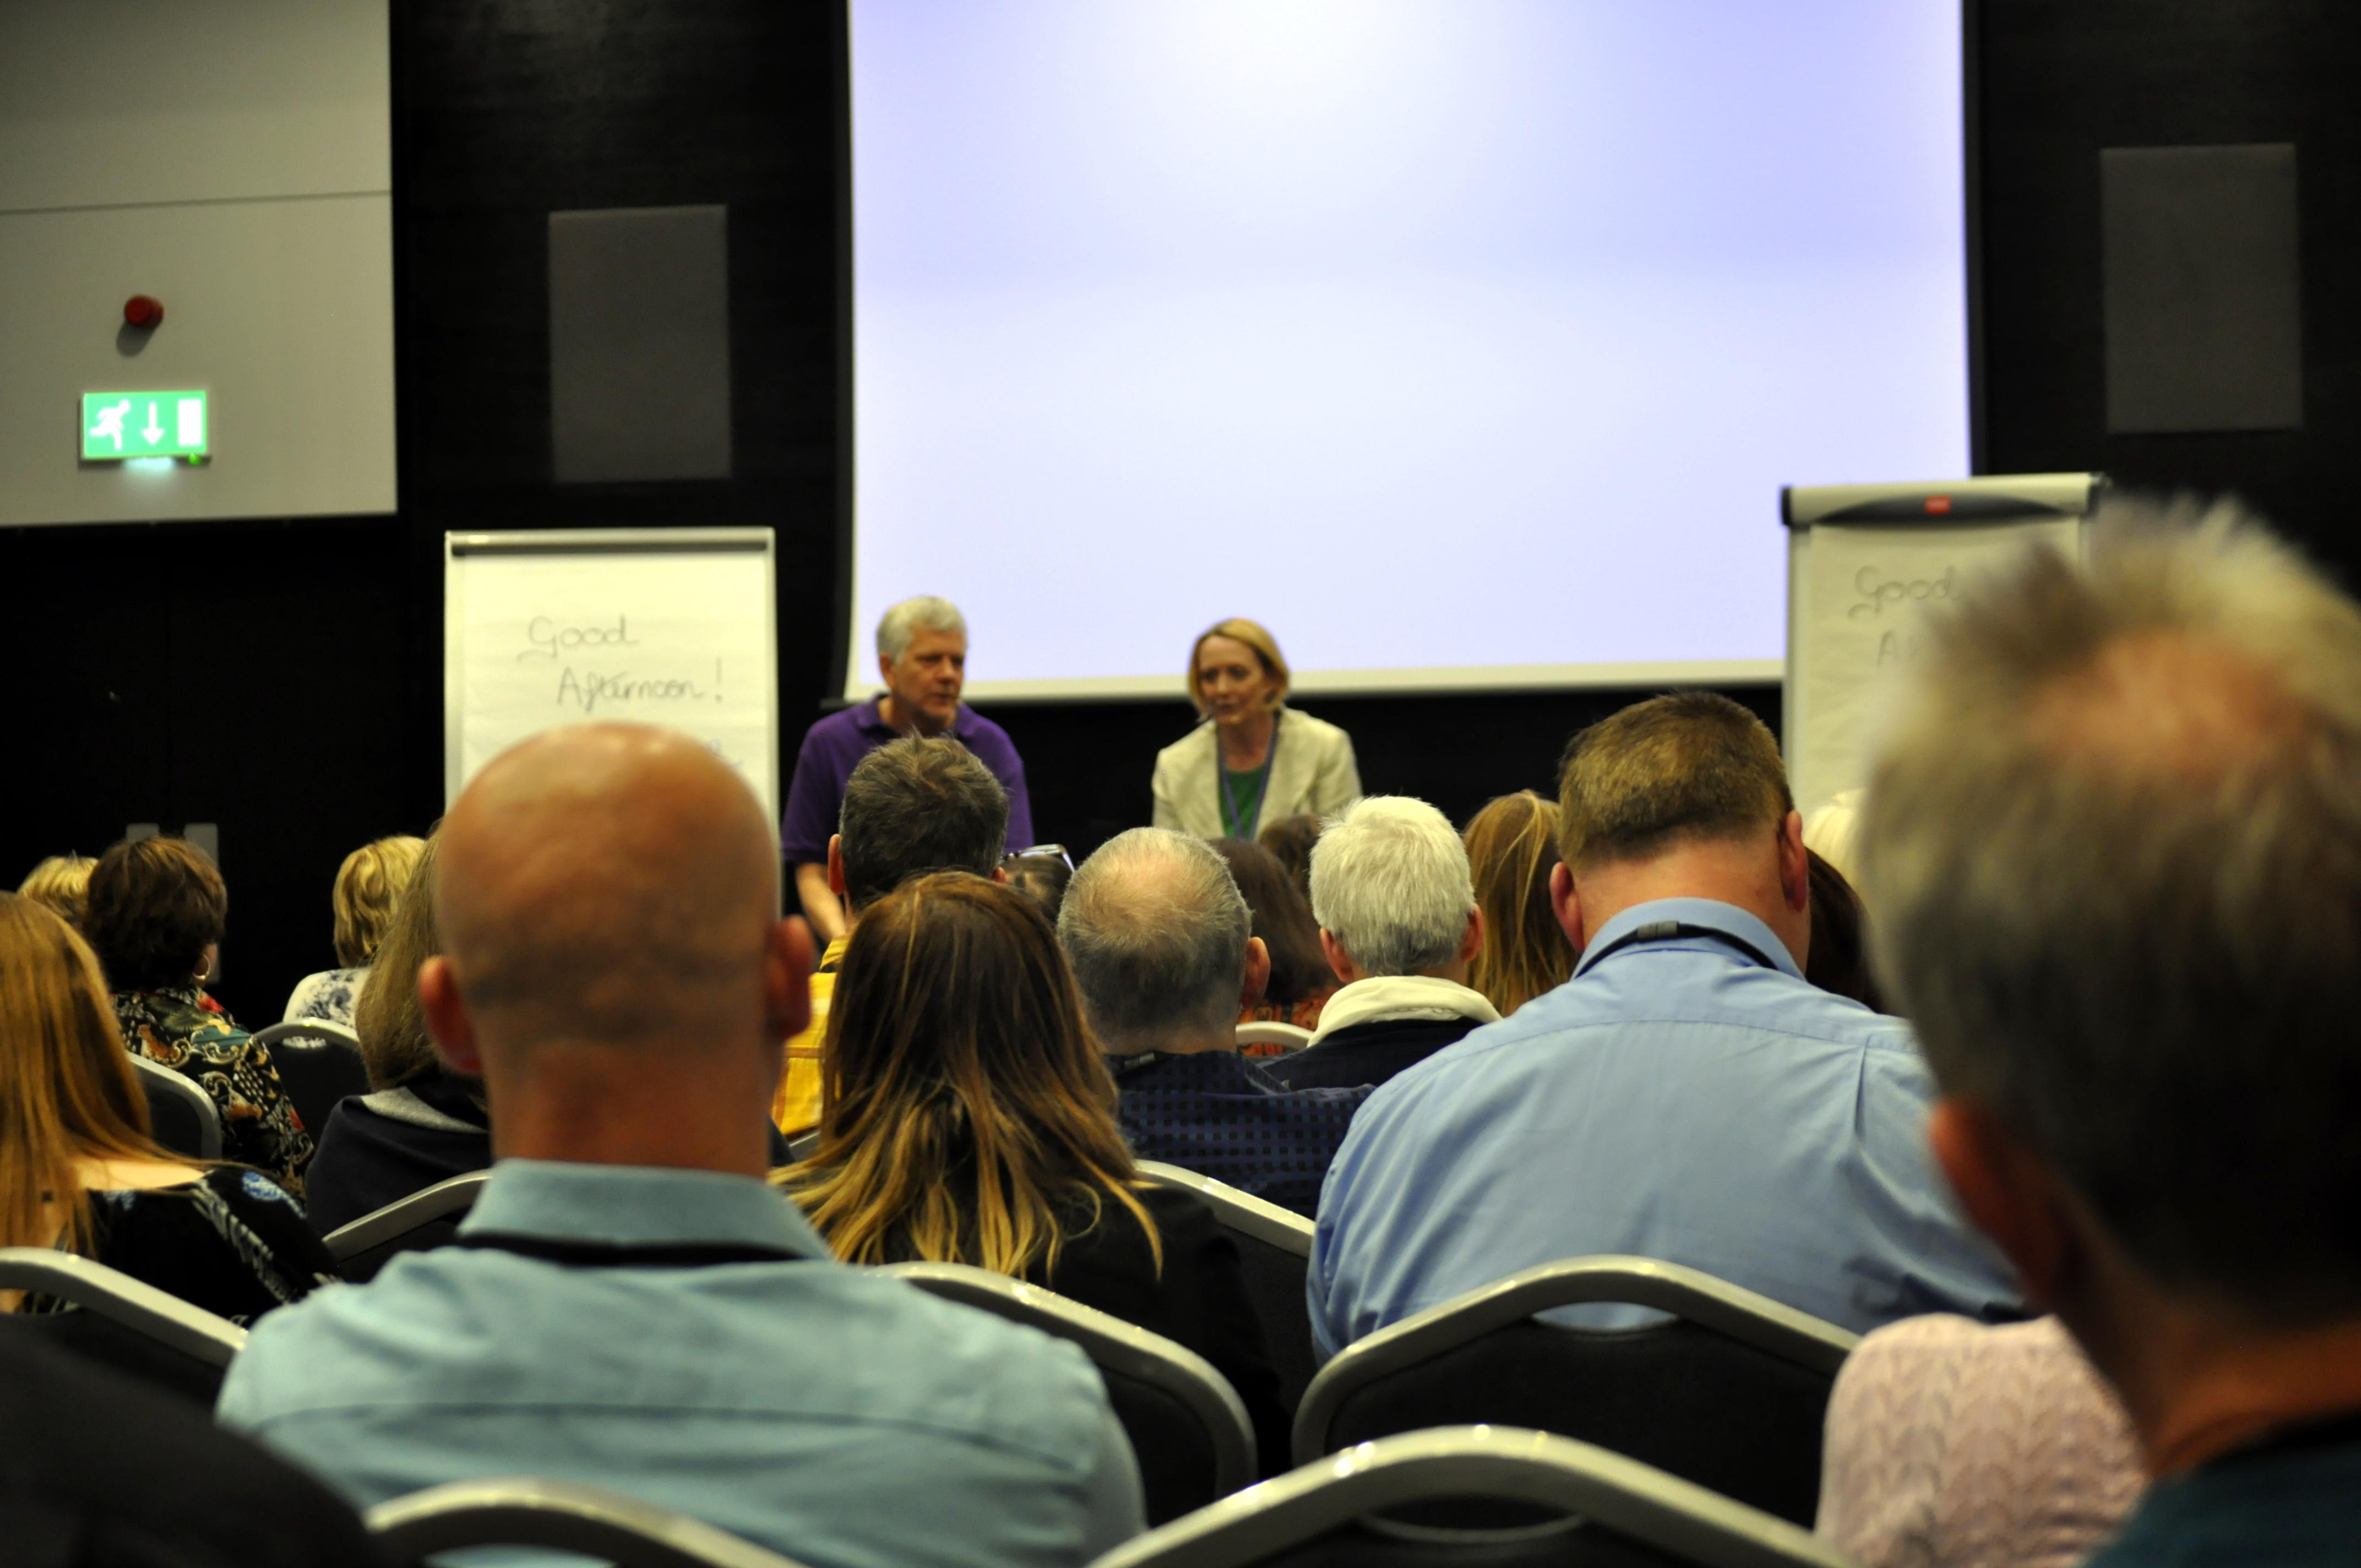 Ian McDermott and Patricia Riddell